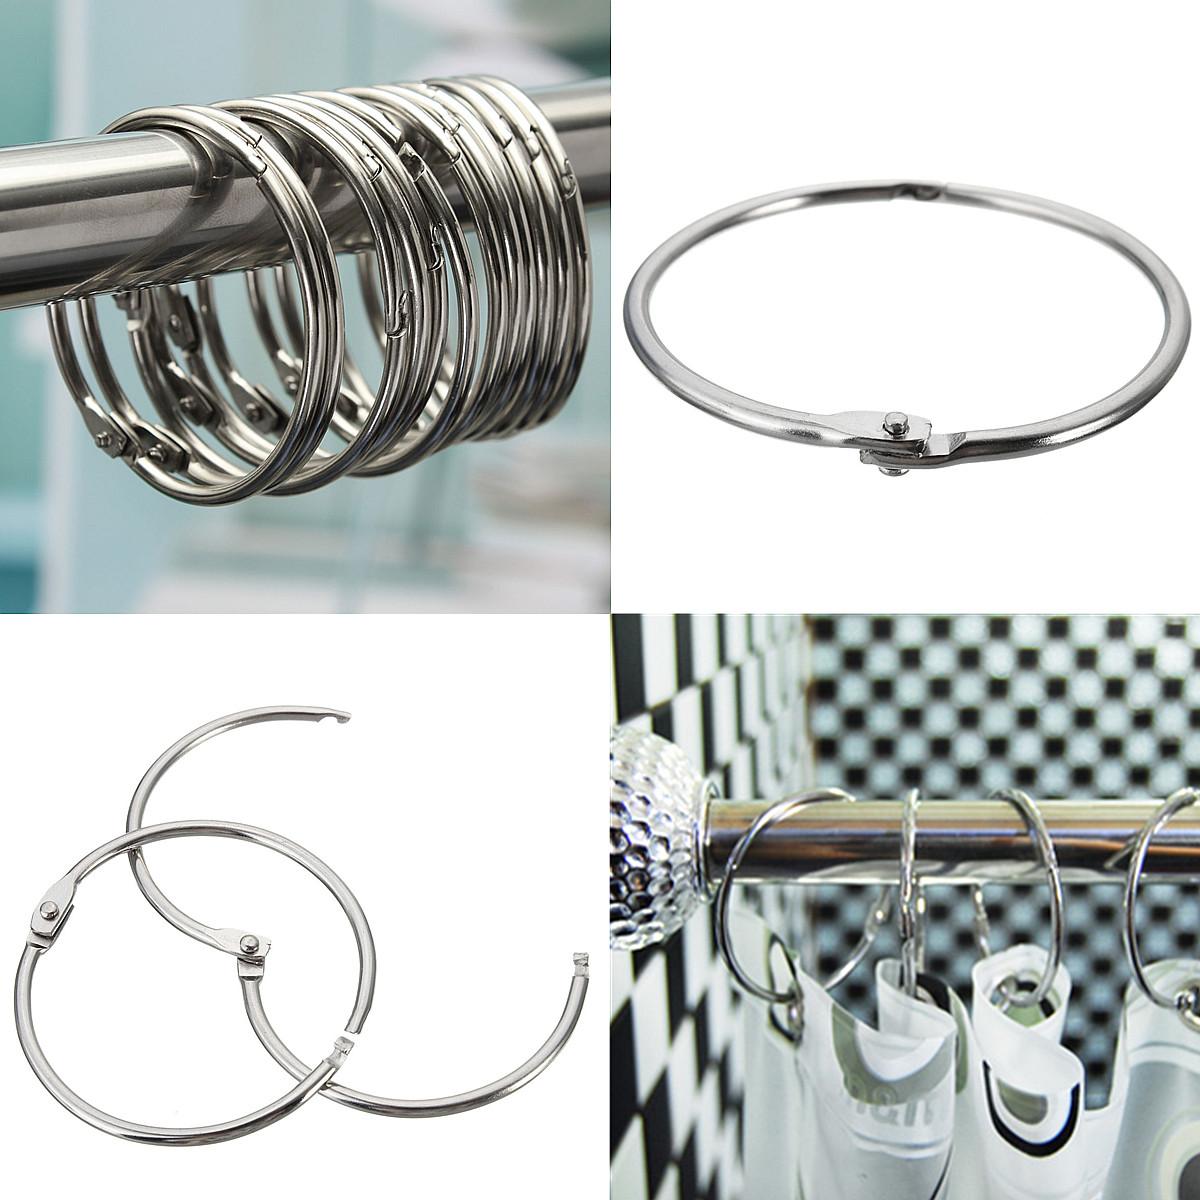 12pcs Round Circular Stainless Steel Shower Curtain Hooks Rings Anti Rust Silver Ebay